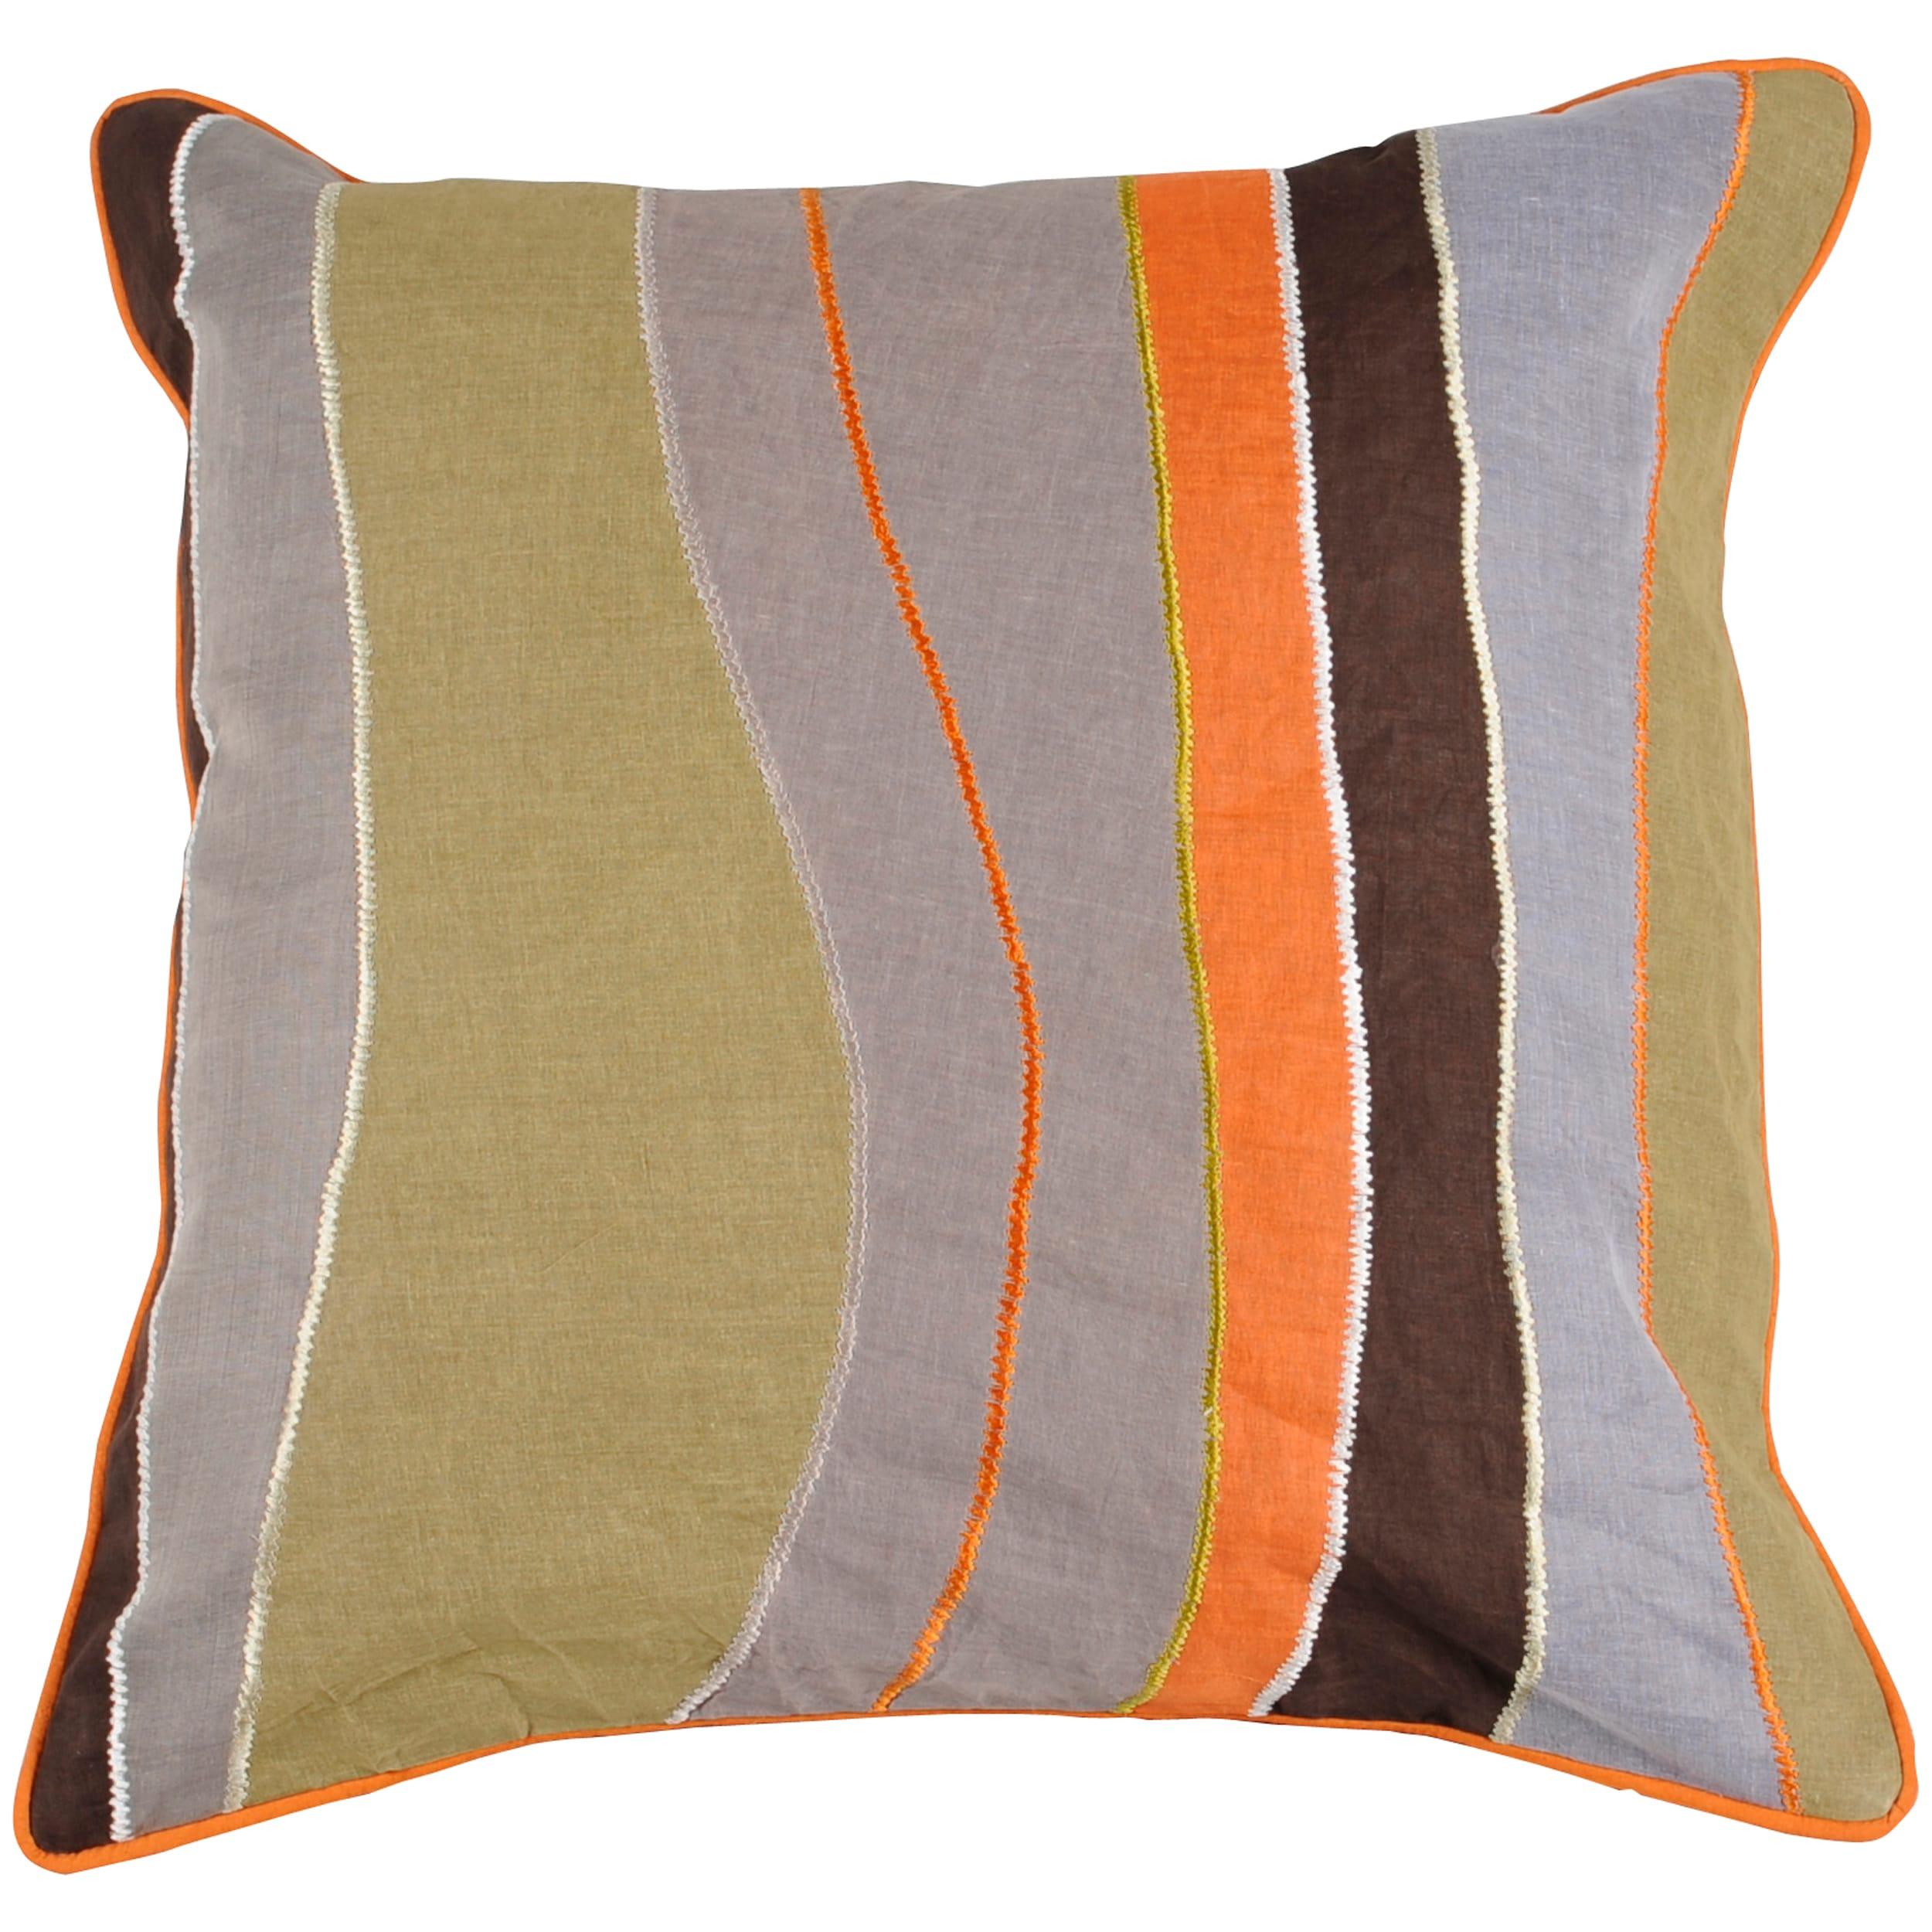 Pate Brown/ Sage/ Grey Stripe 18-inch Square Down Decorative Pillow